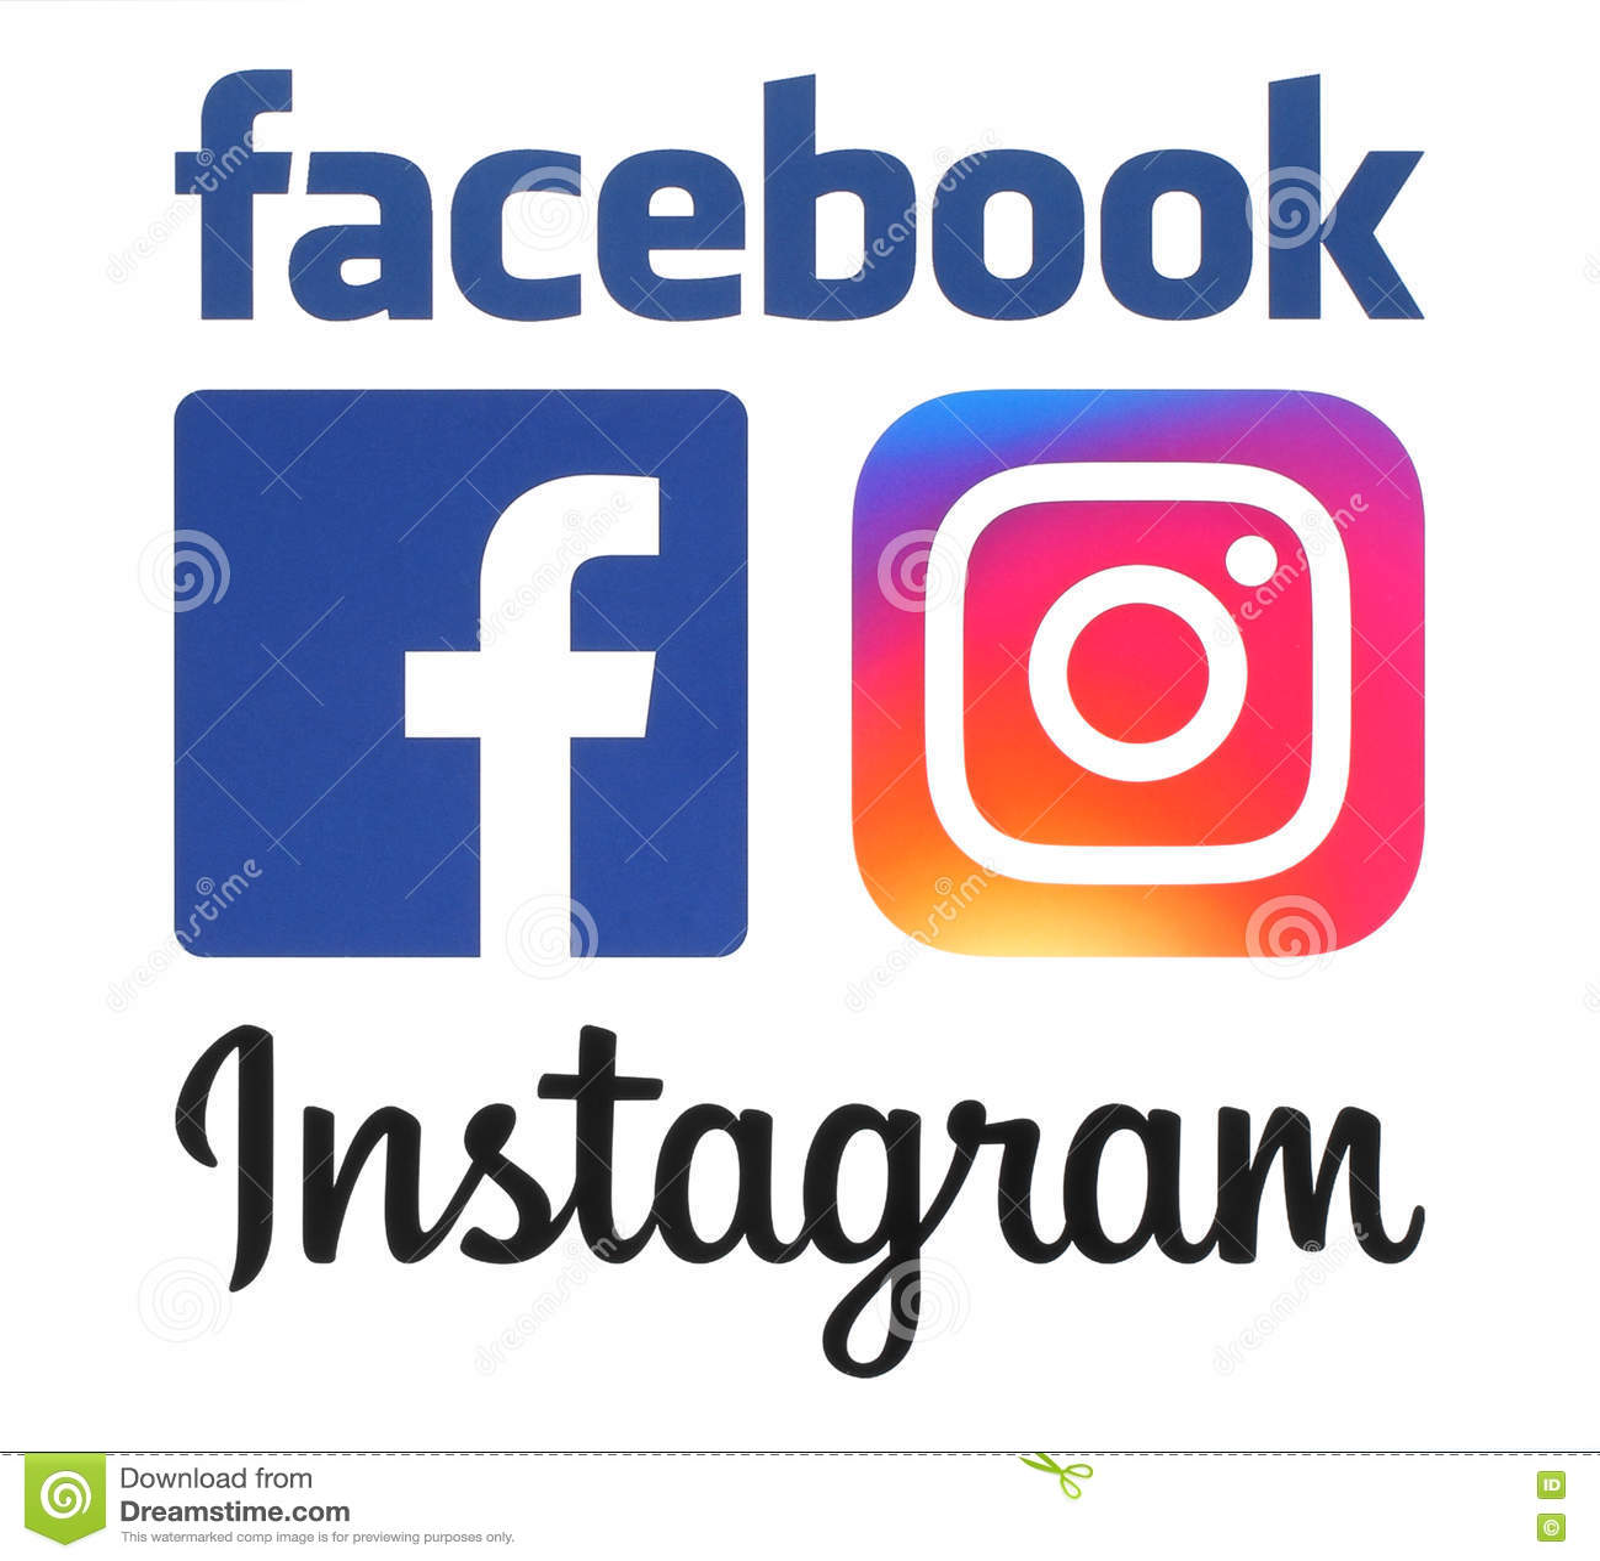 new instagram and facebook logos editorial photo illustration of communication illustrative. Black Bedroom Furniture Sets. Home Design Ideas